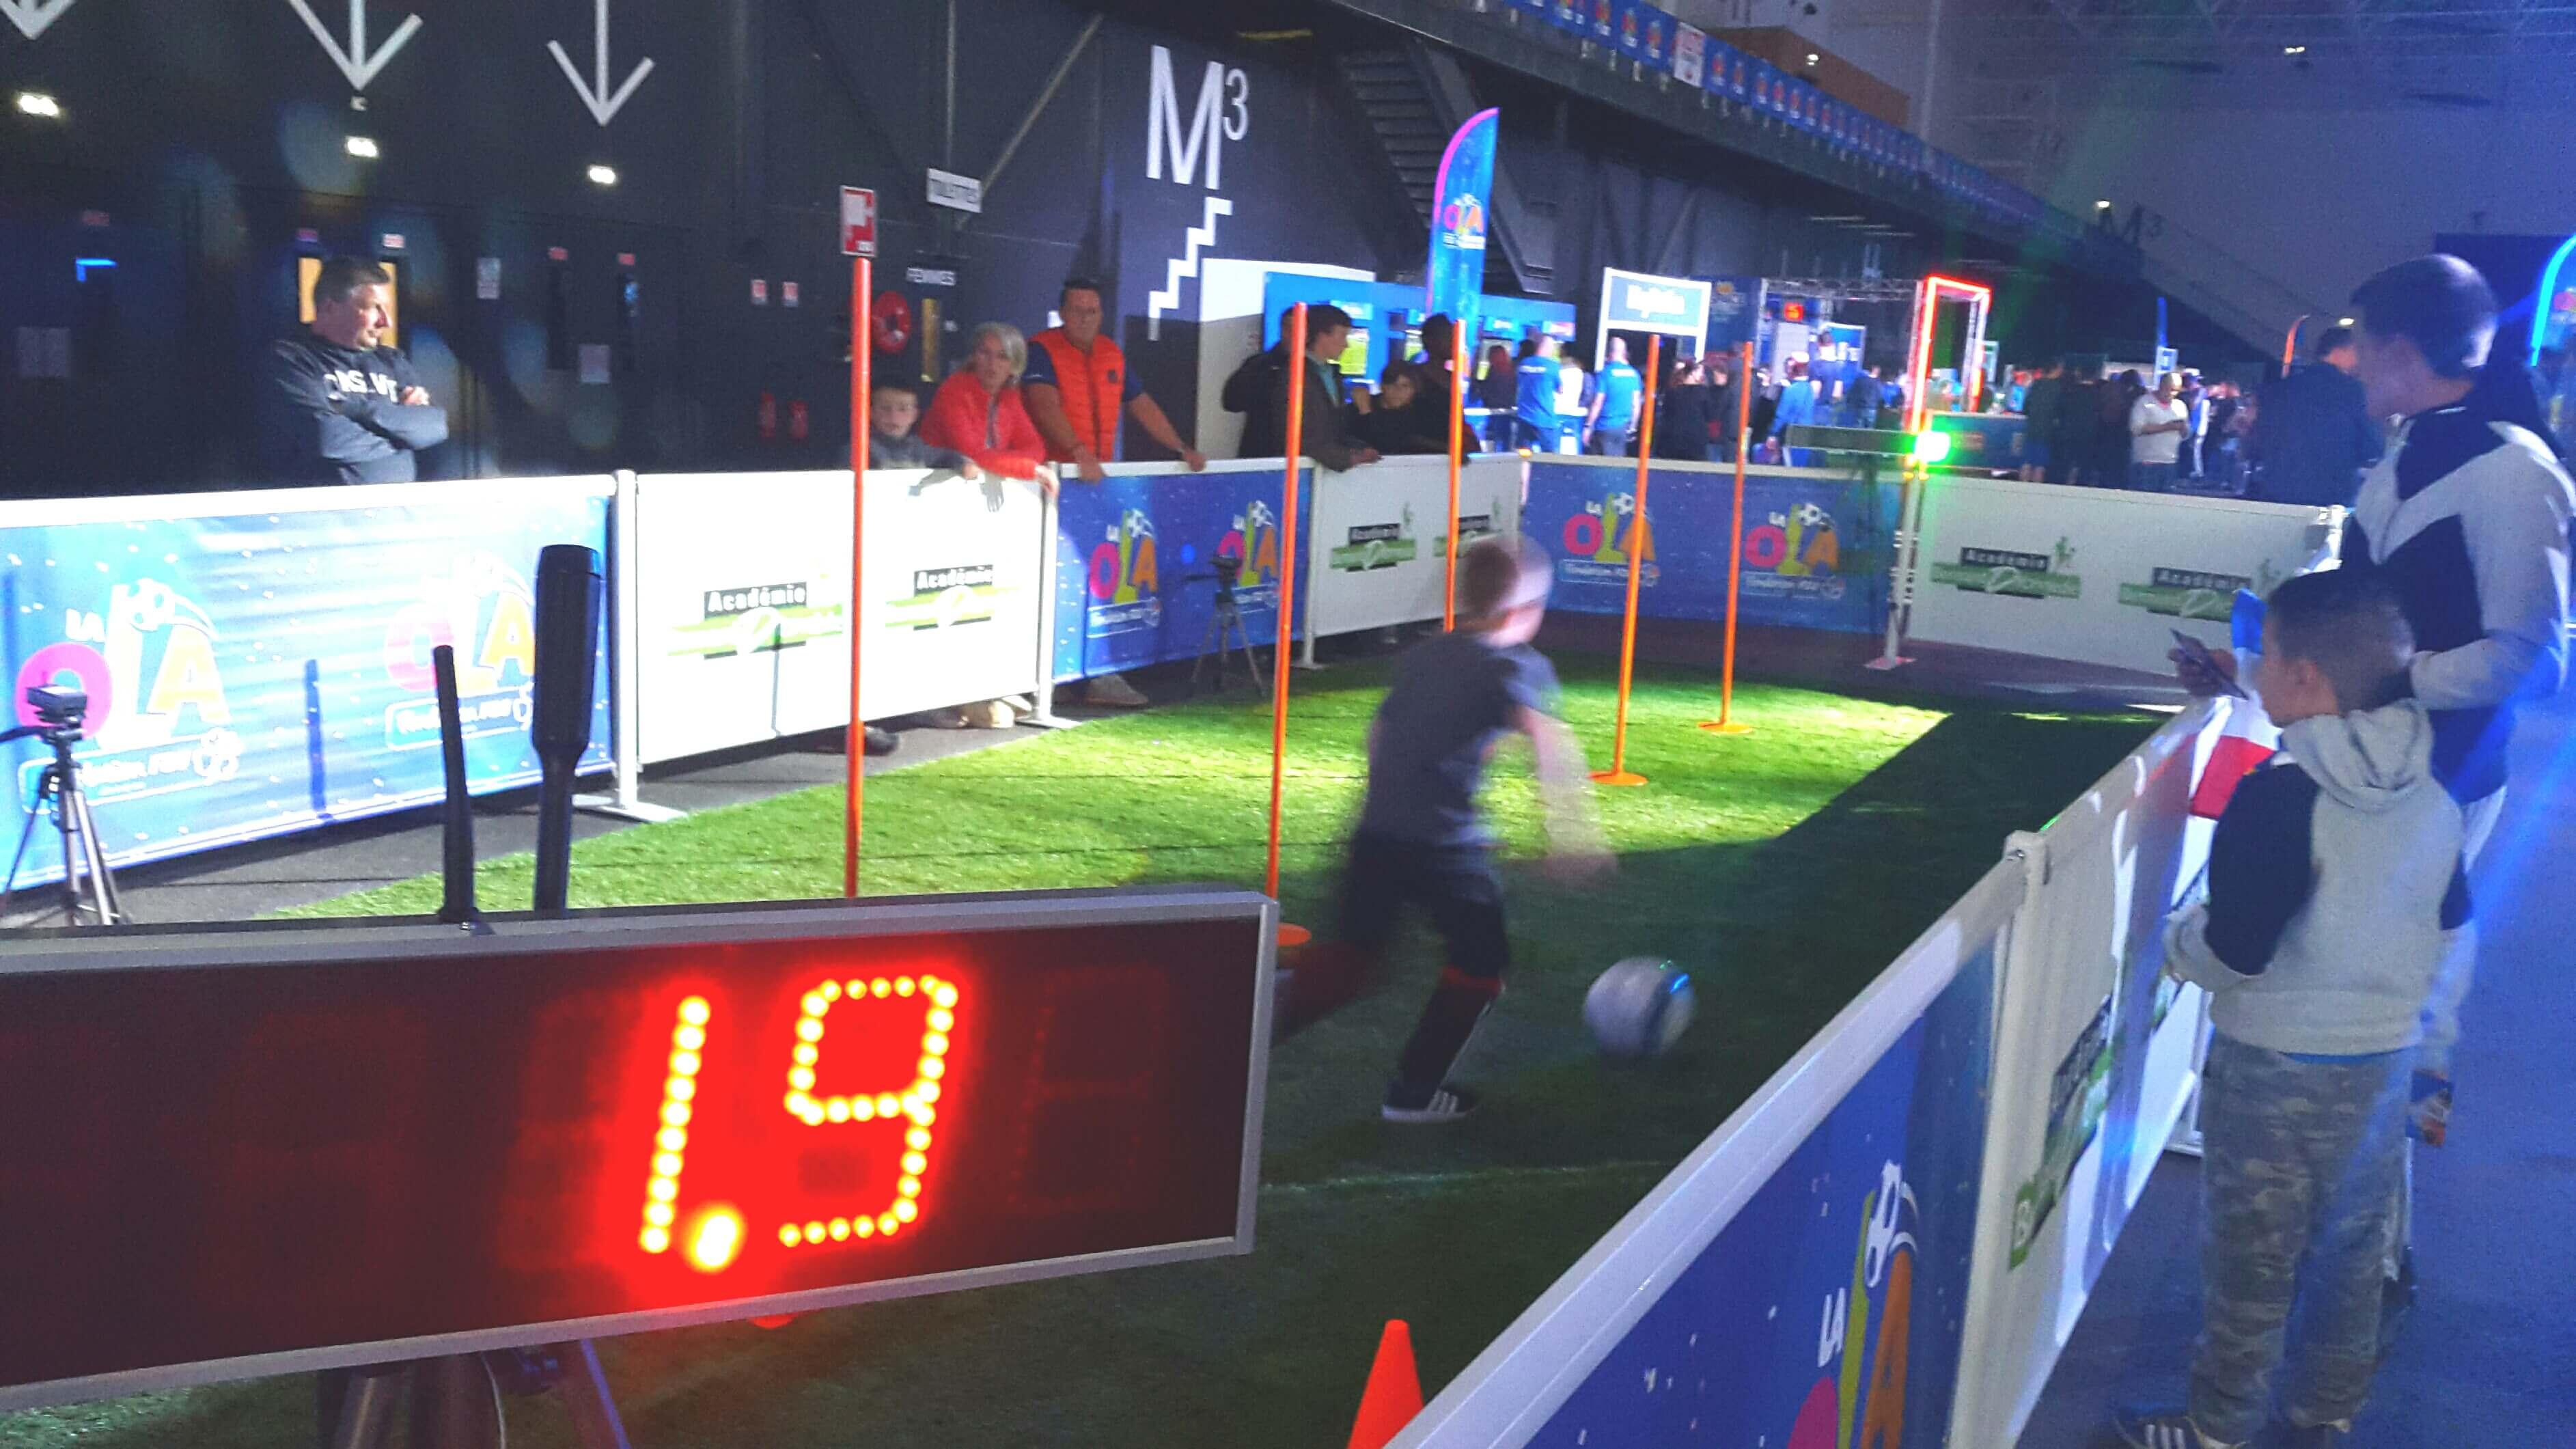 Parcours Radar Handball